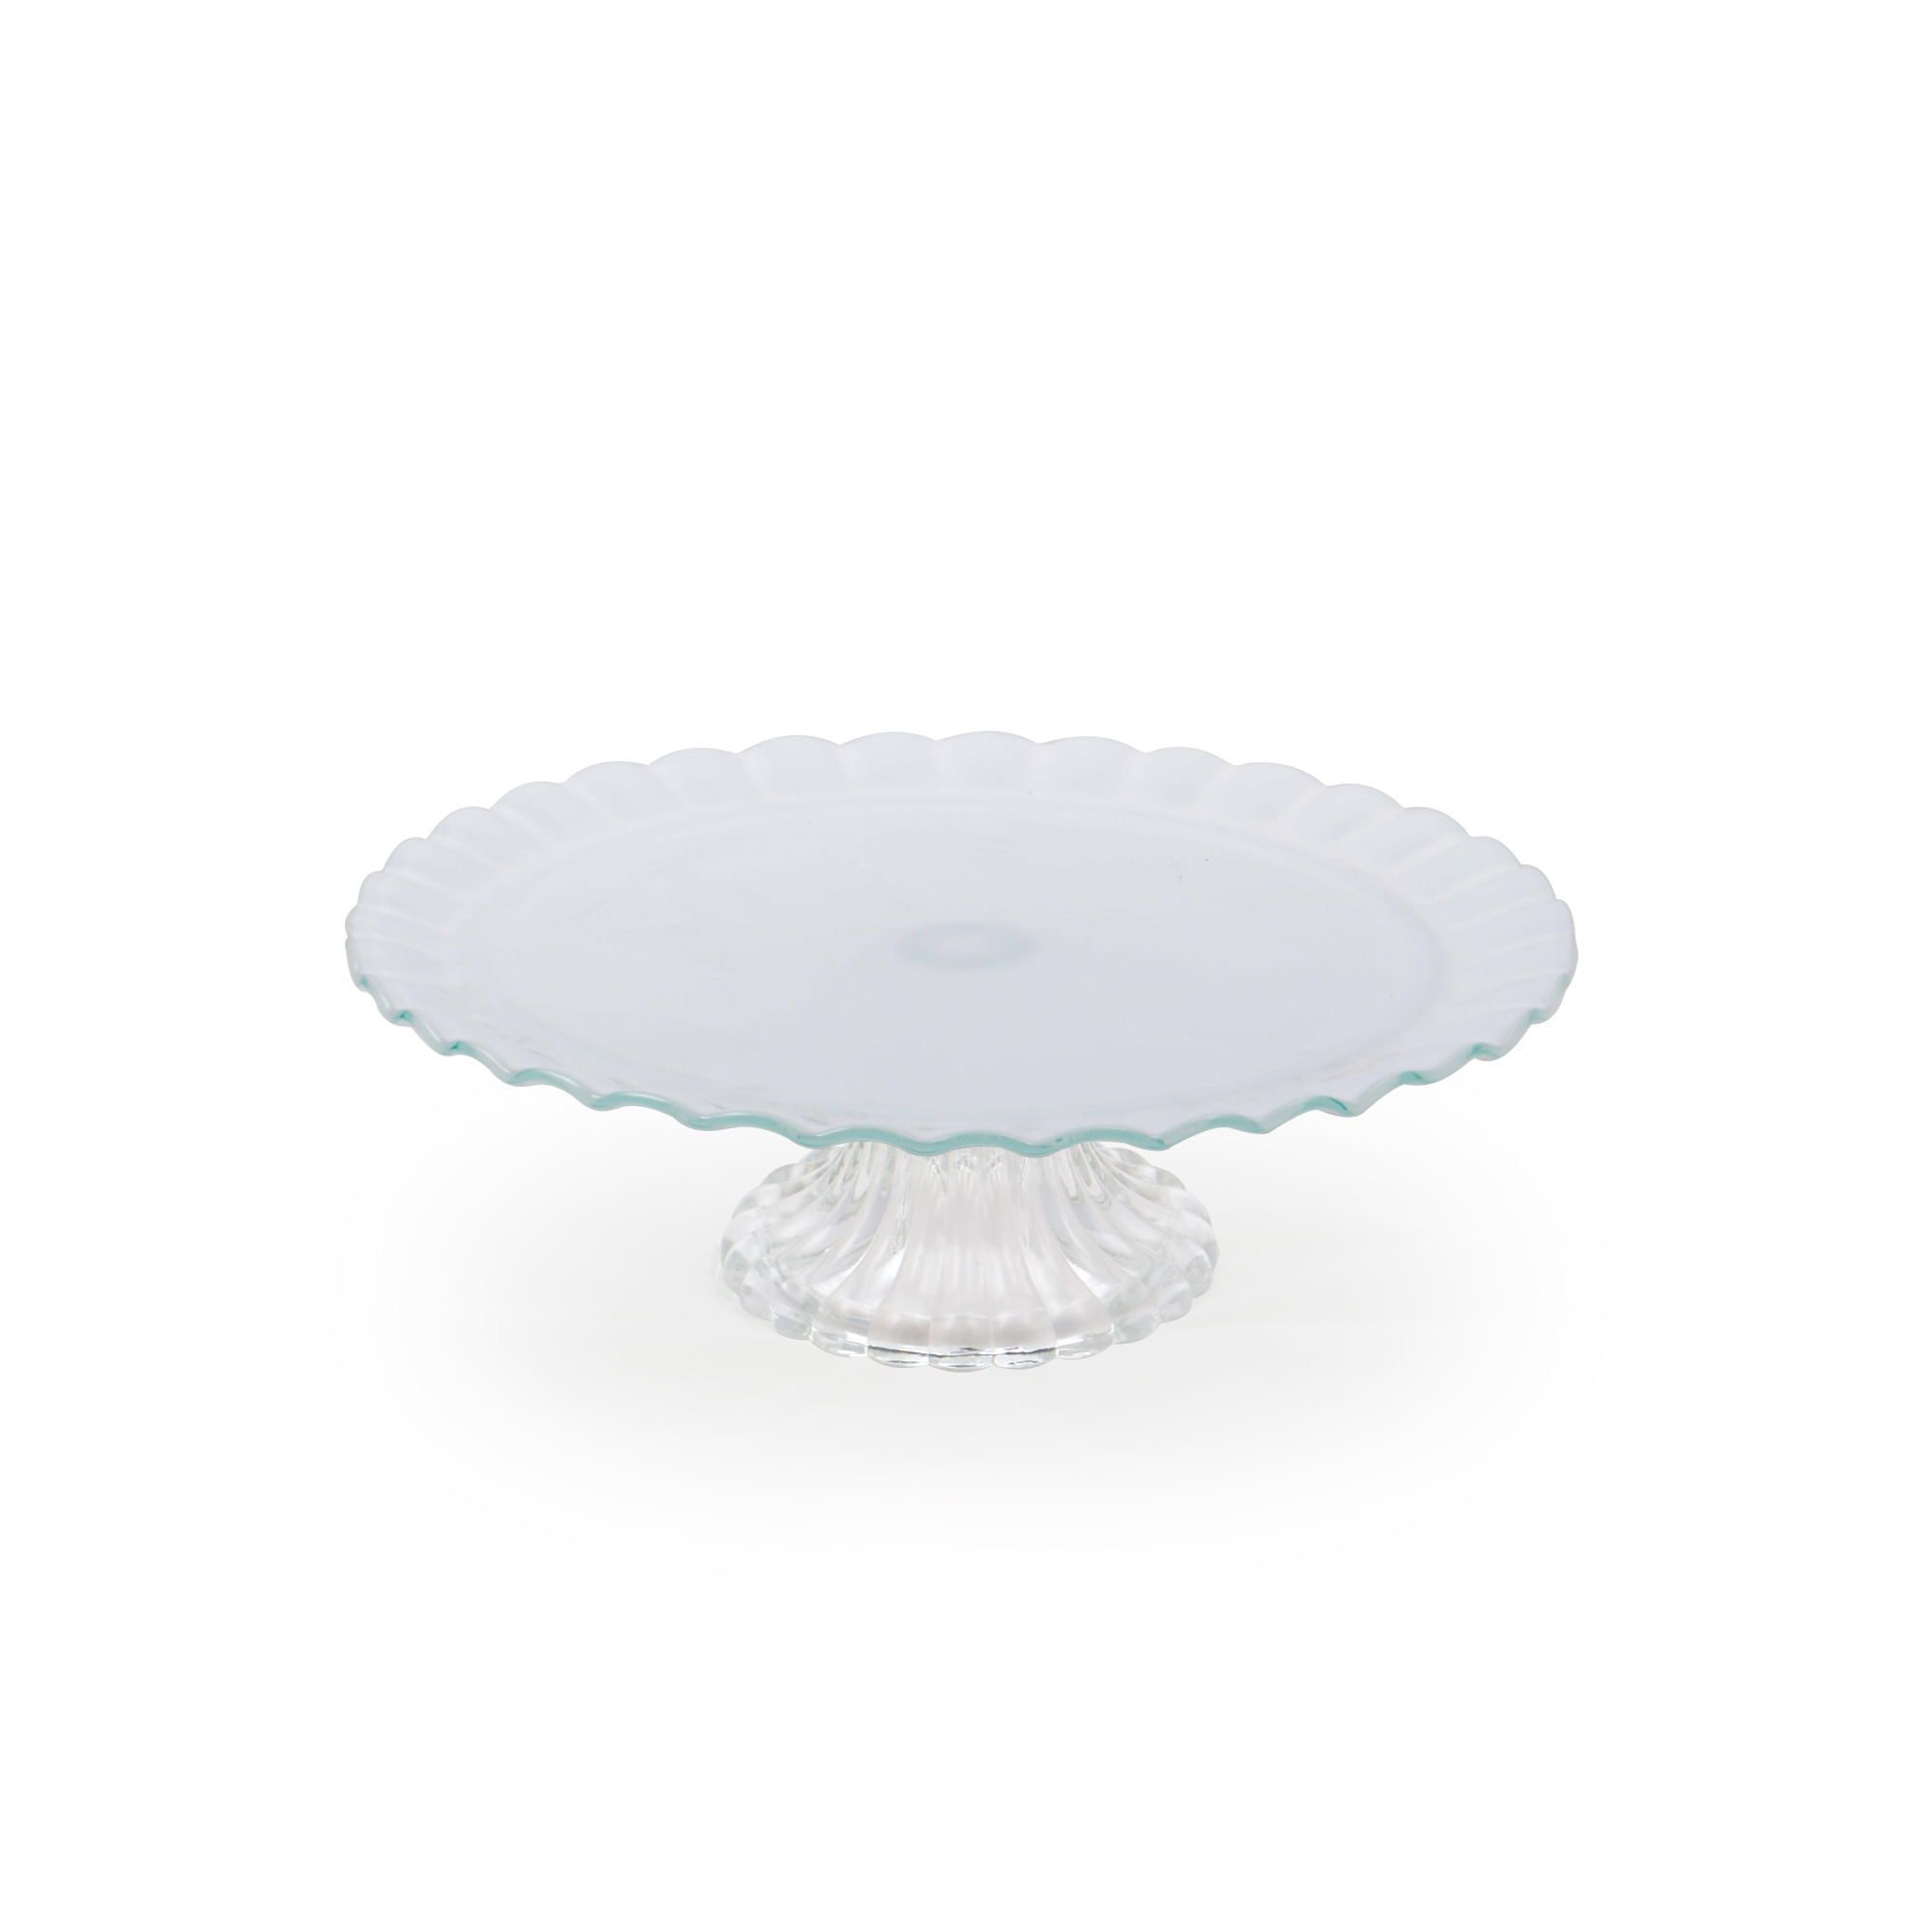 Boleira de vidro média branca